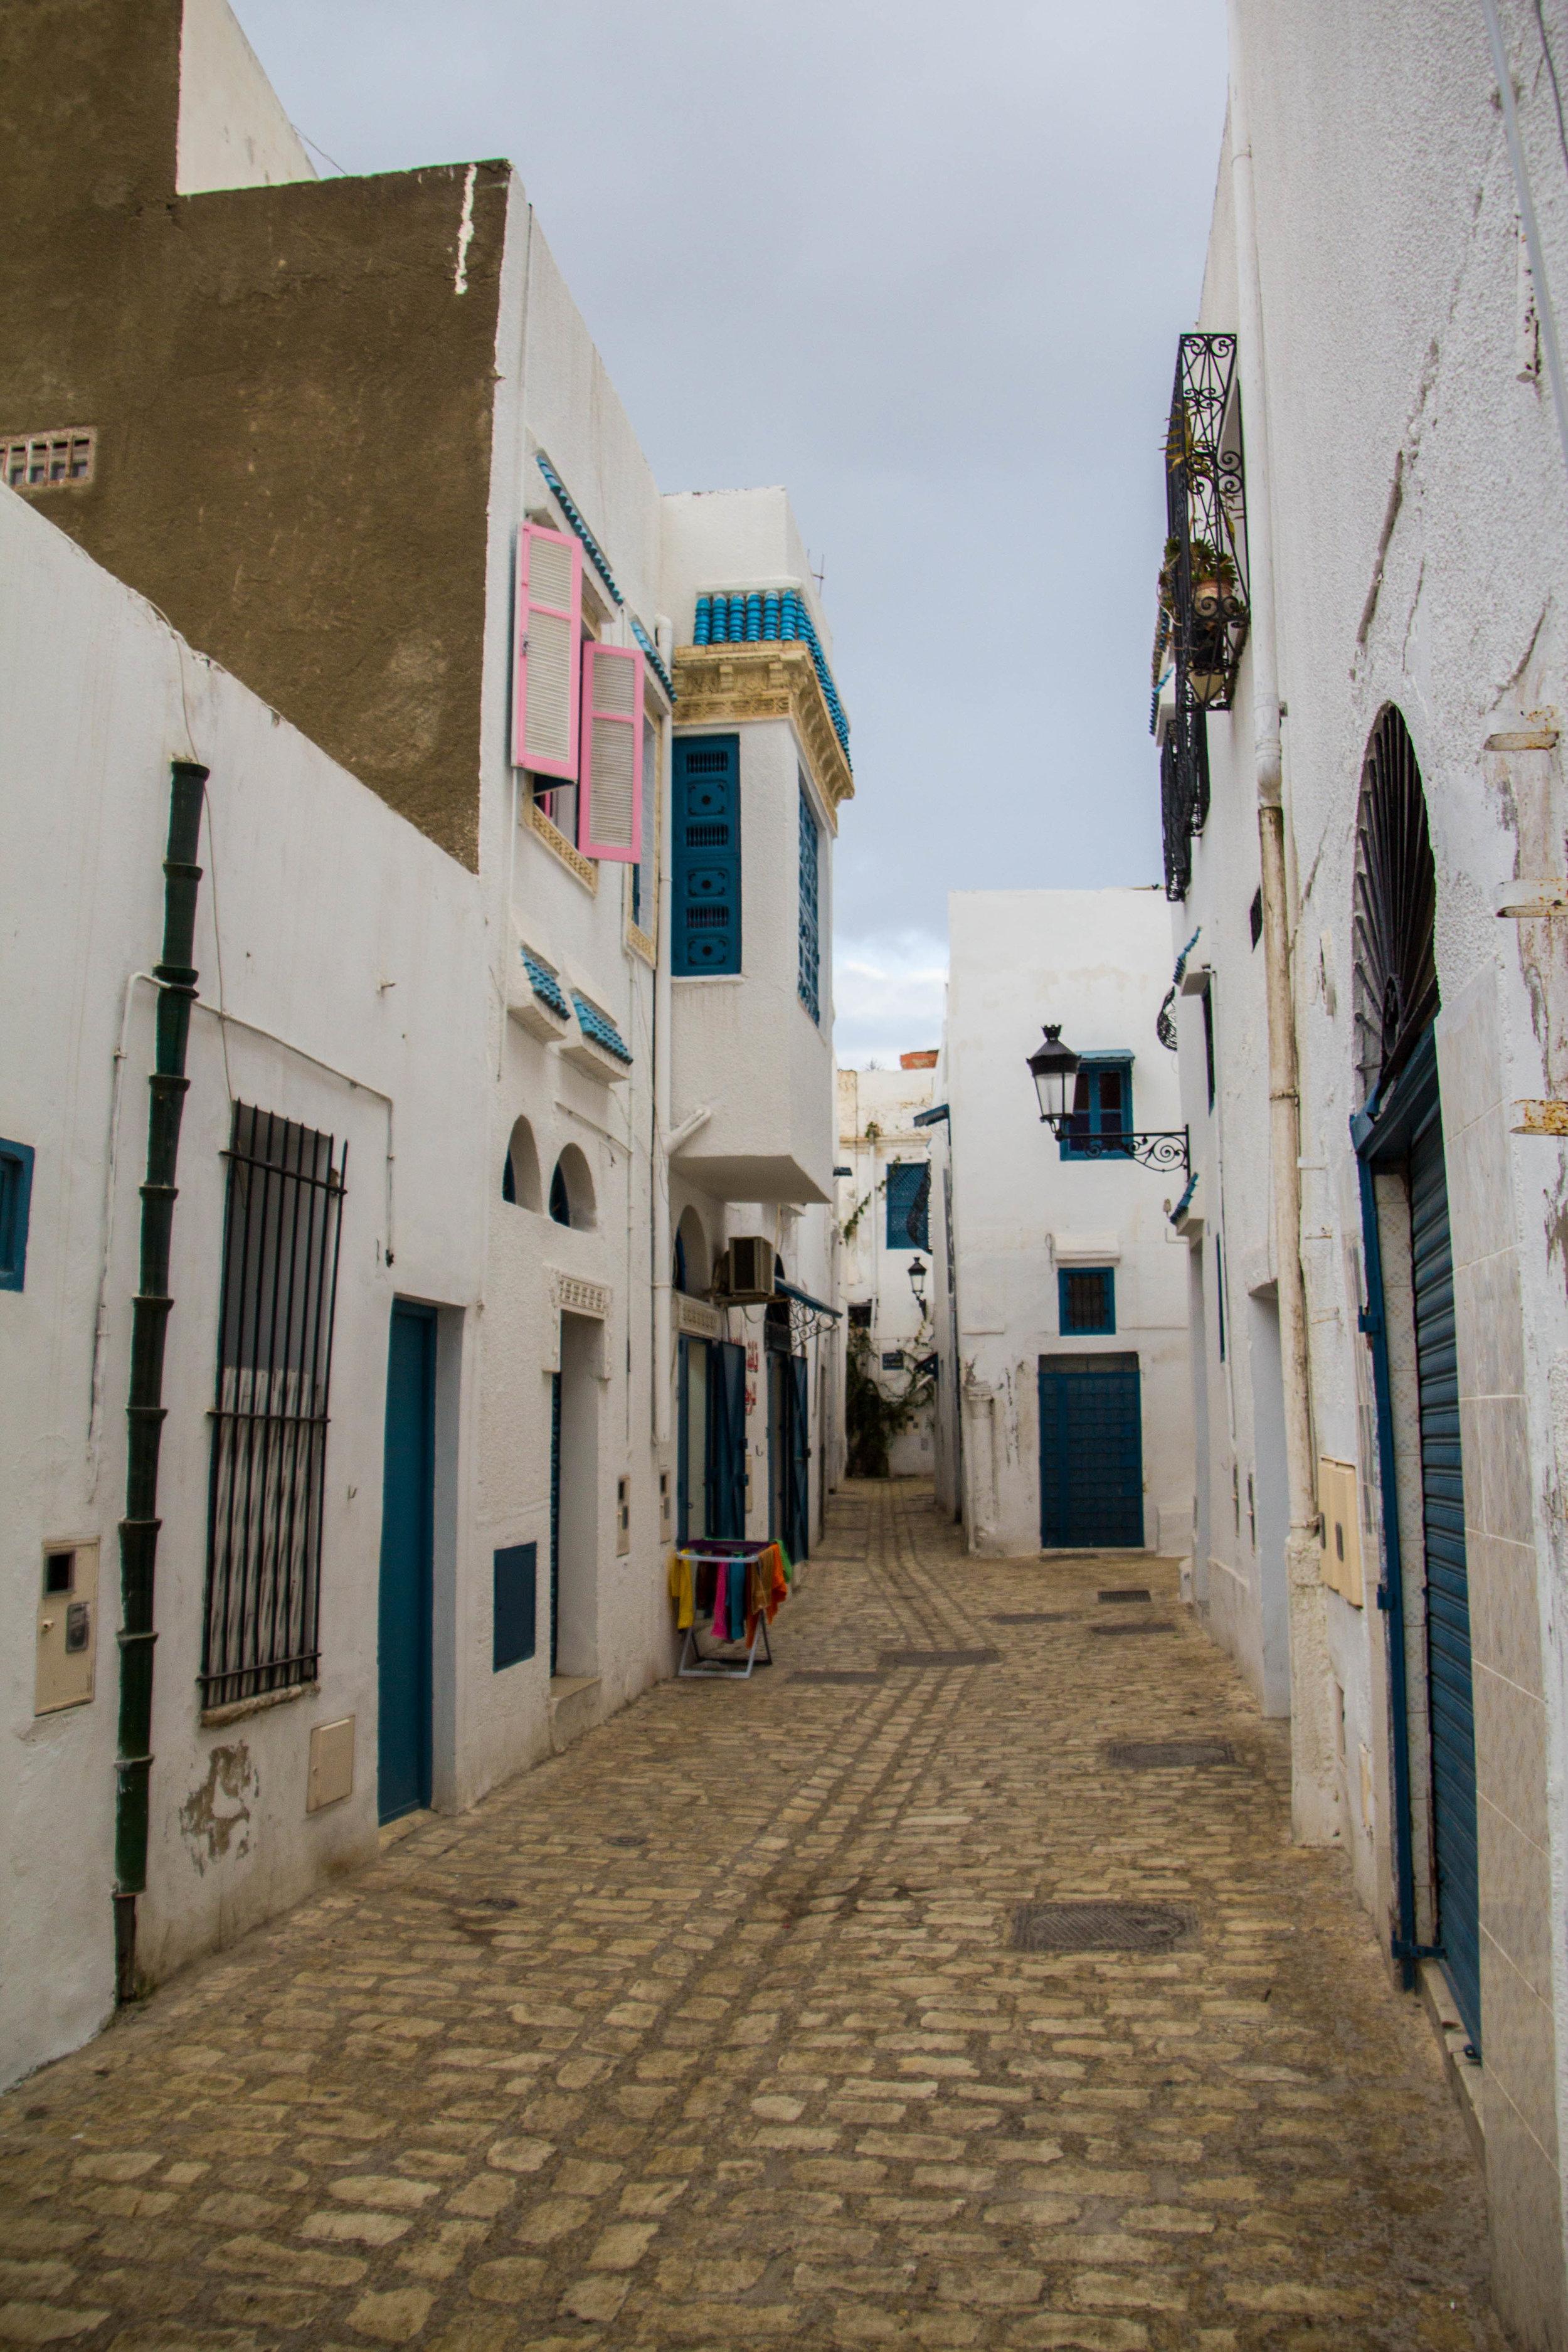 medina-photography-tunis-tunisia-45.jpg